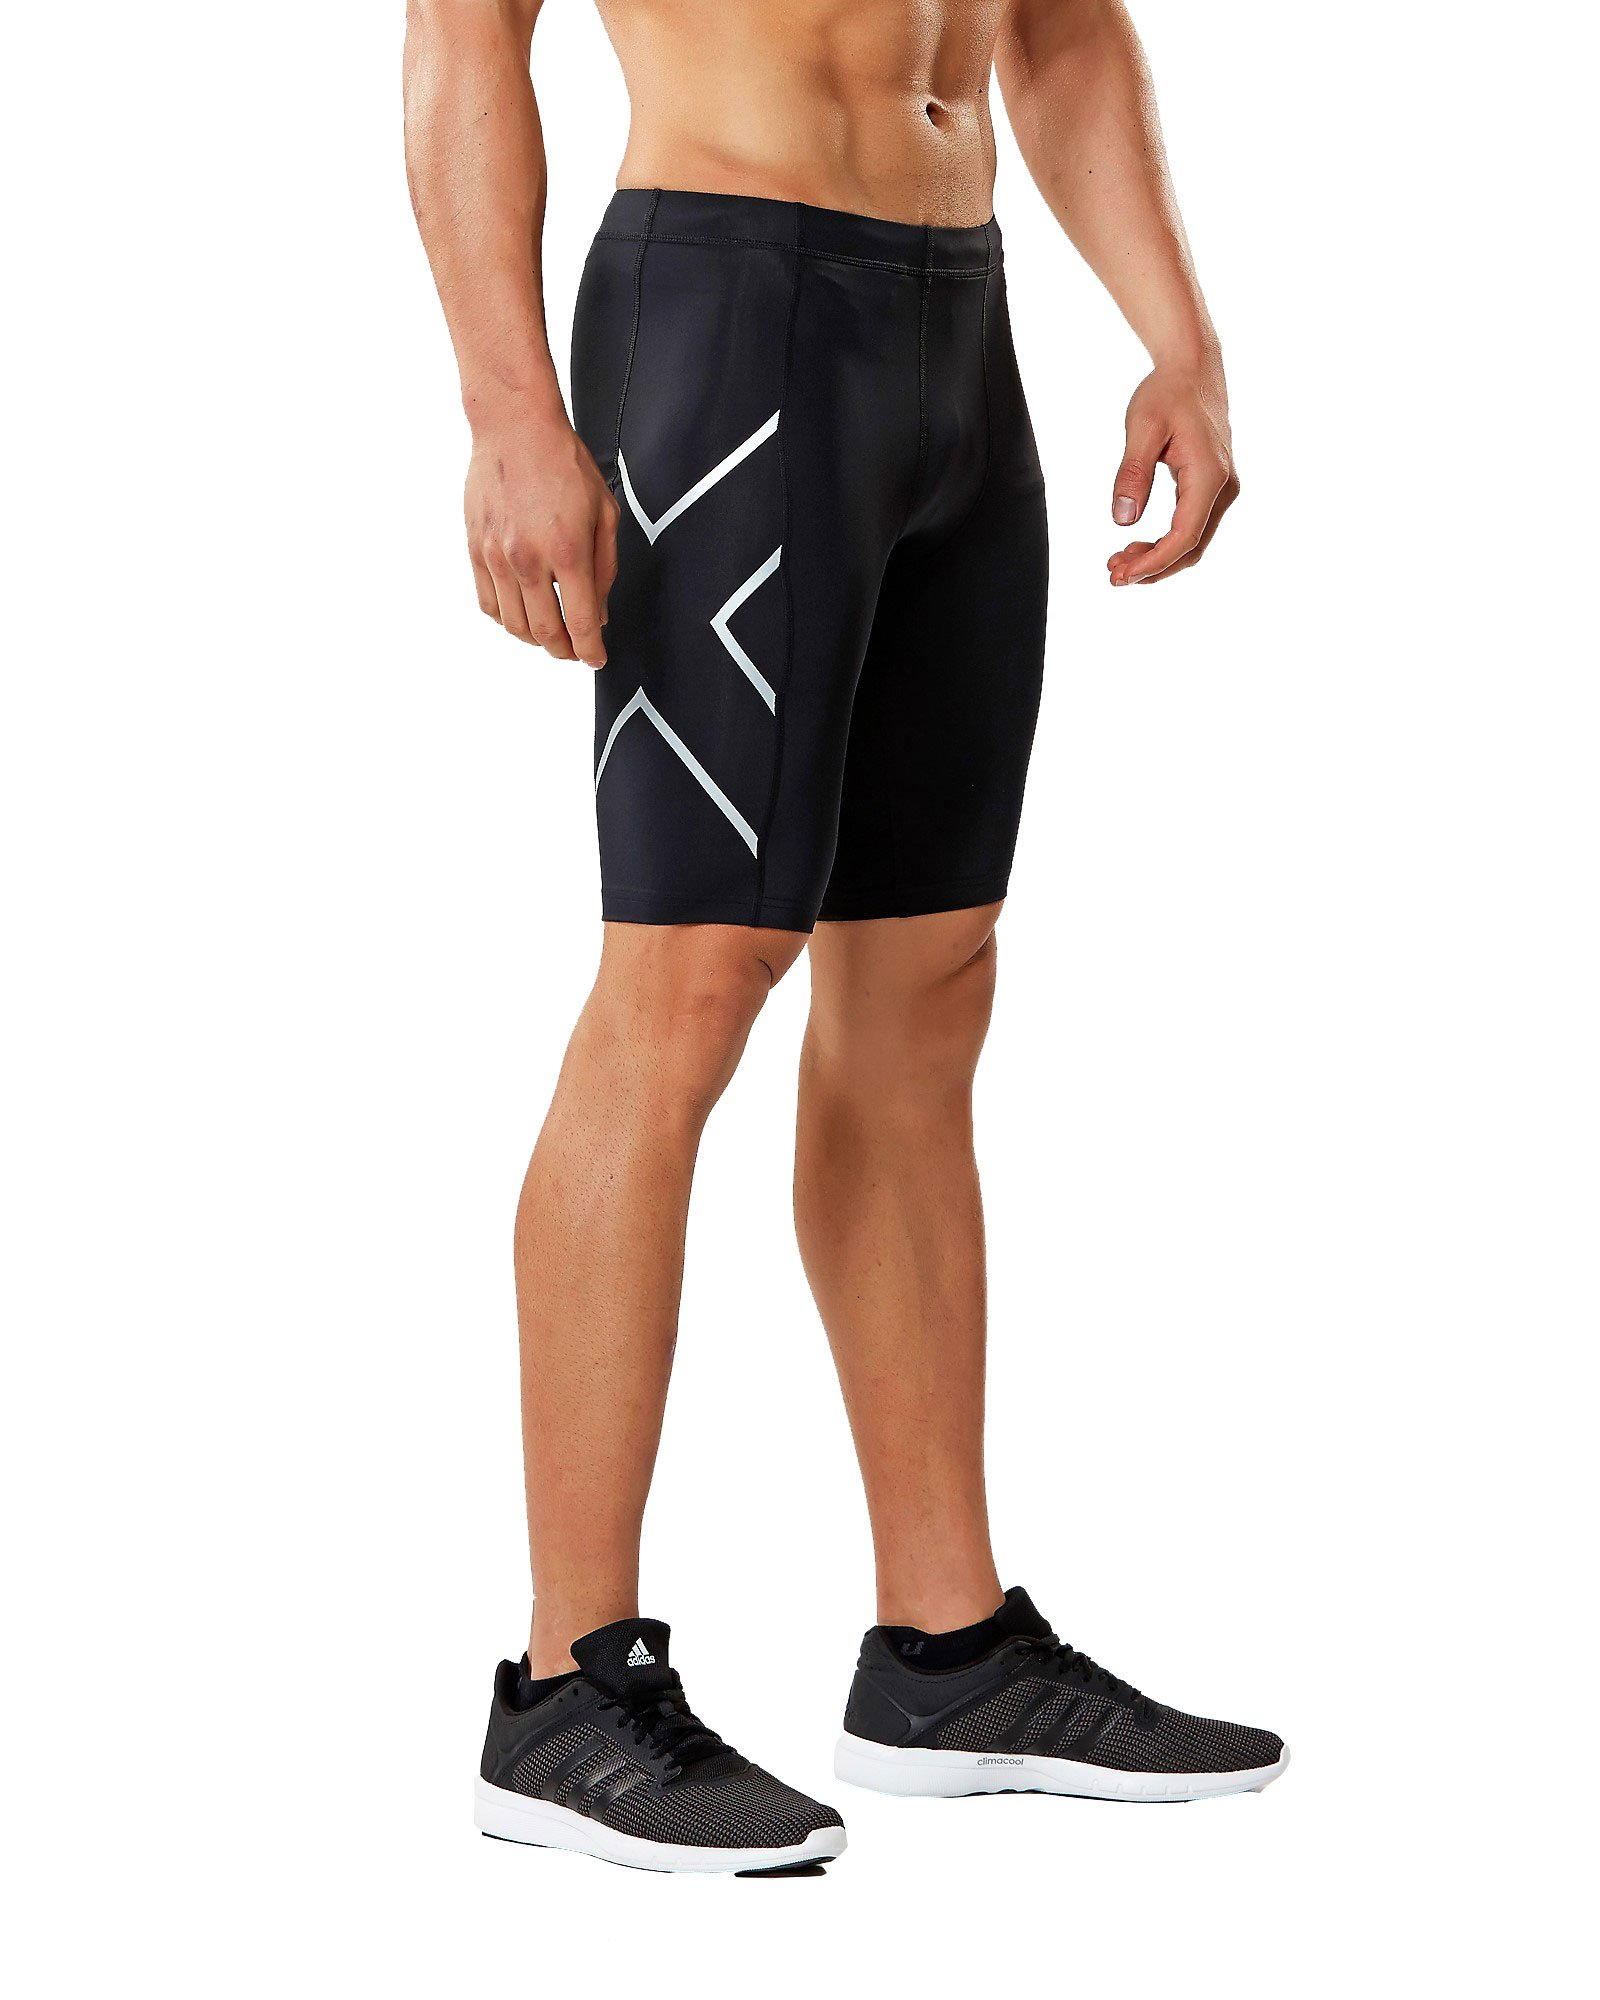 2XU Core Compression Shorts, Black/Silver, Medium by 2XU (Image #1)